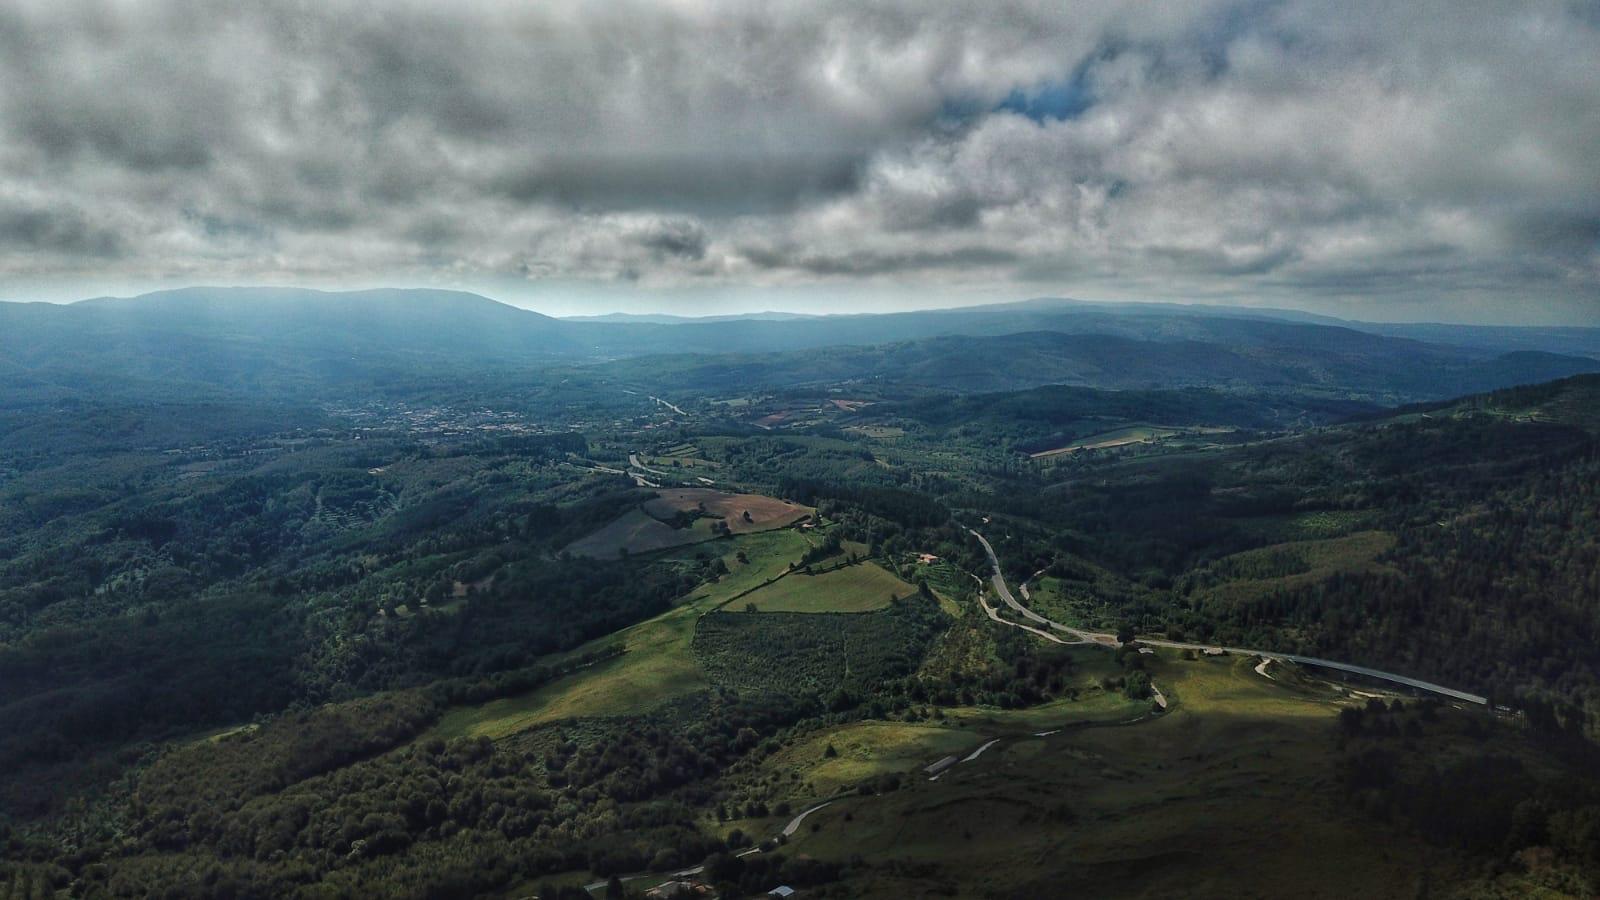 In Calabria i panorami del Sentiero Italia CAI entusiasmano la Pro Loco Squillace